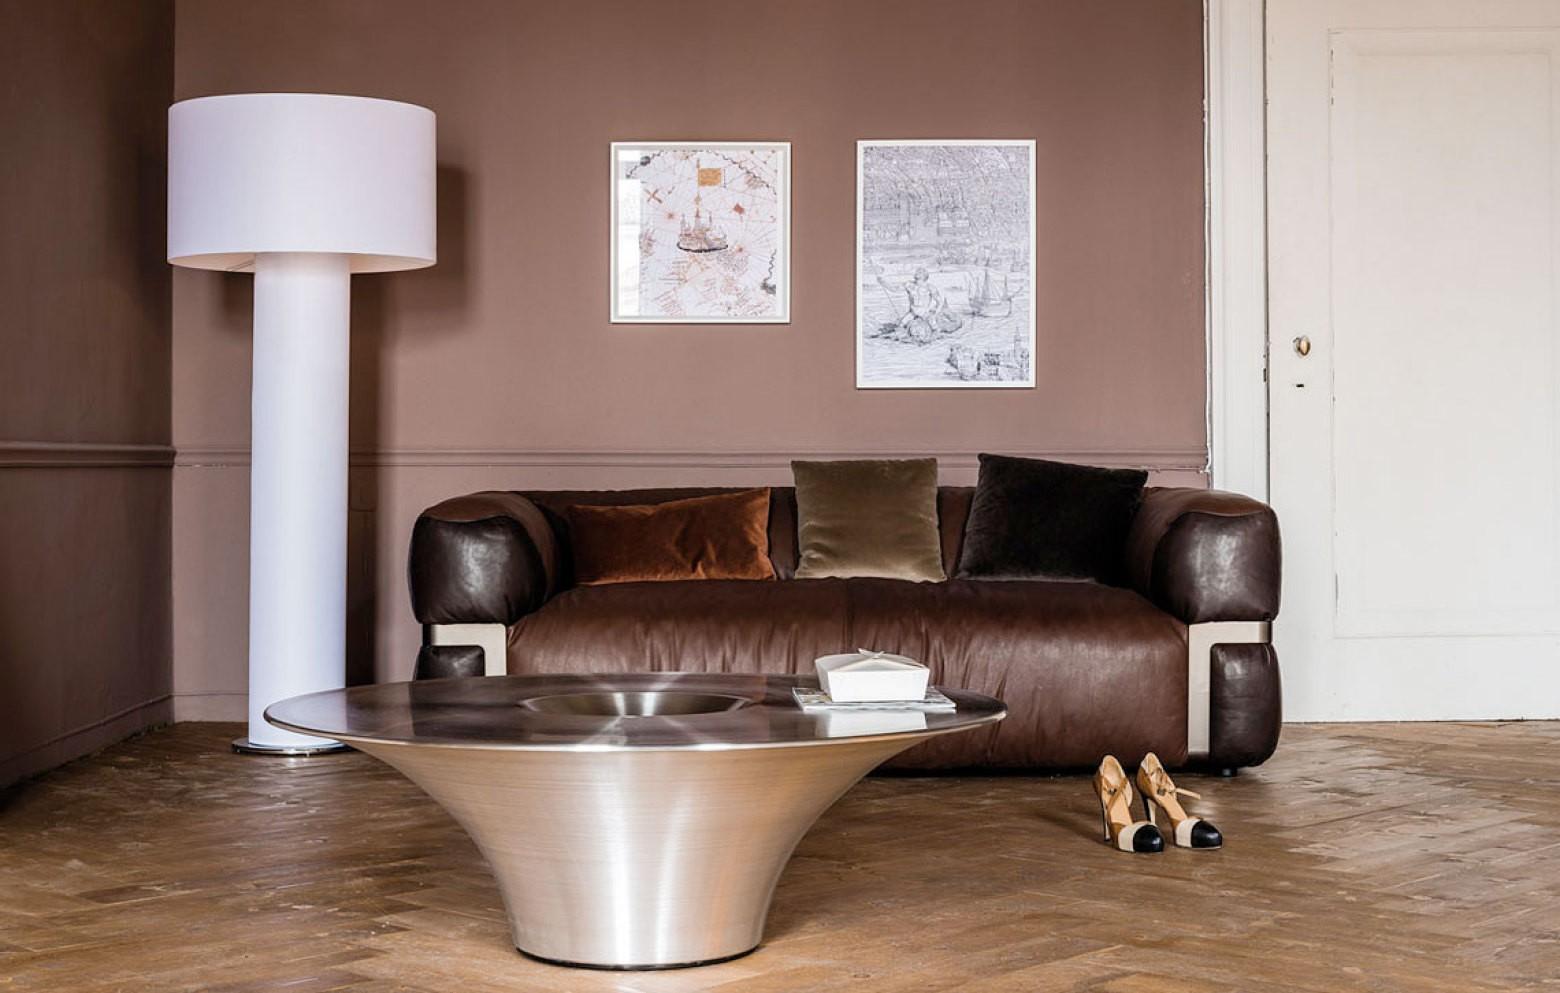 alien couchtische kleinm bel accessoires who 39 s perfect. Black Bedroom Furniture Sets. Home Design Ideas